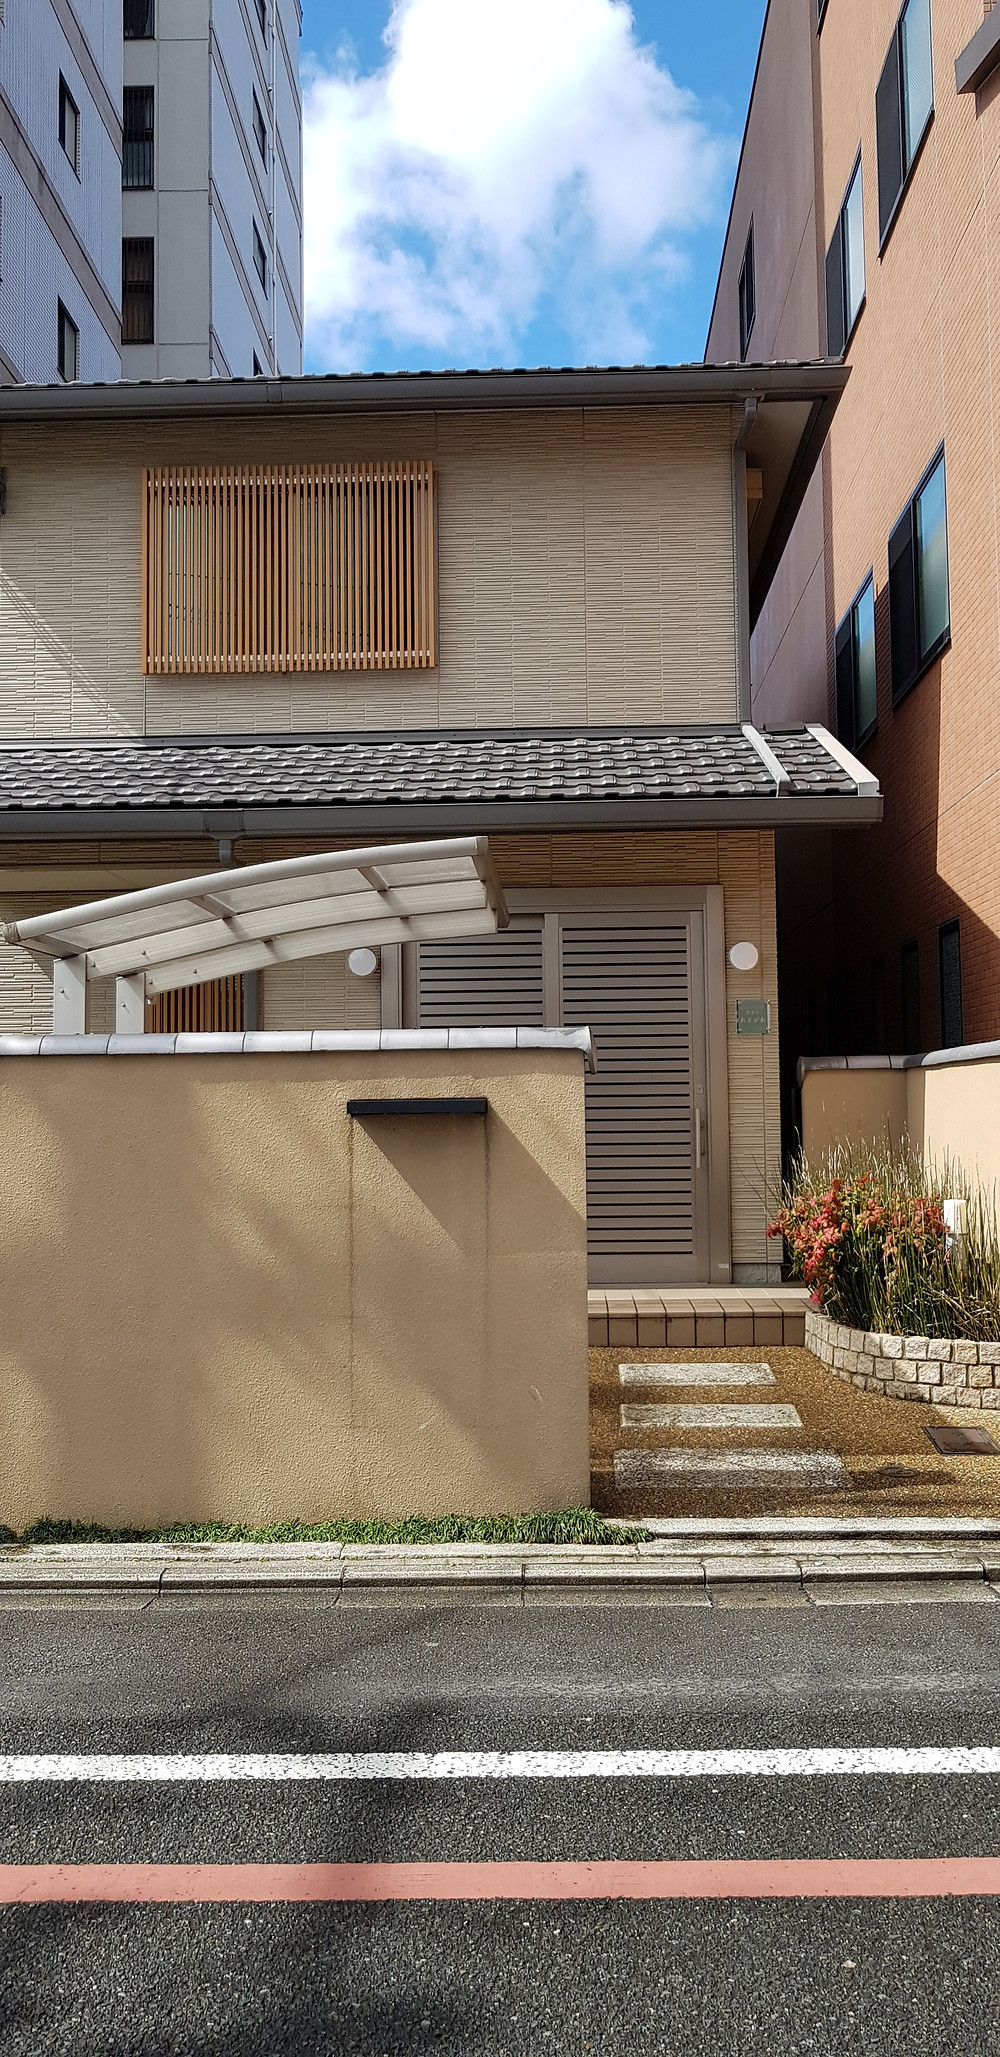 Modern Japanese Architecture, Kyoto, Japan